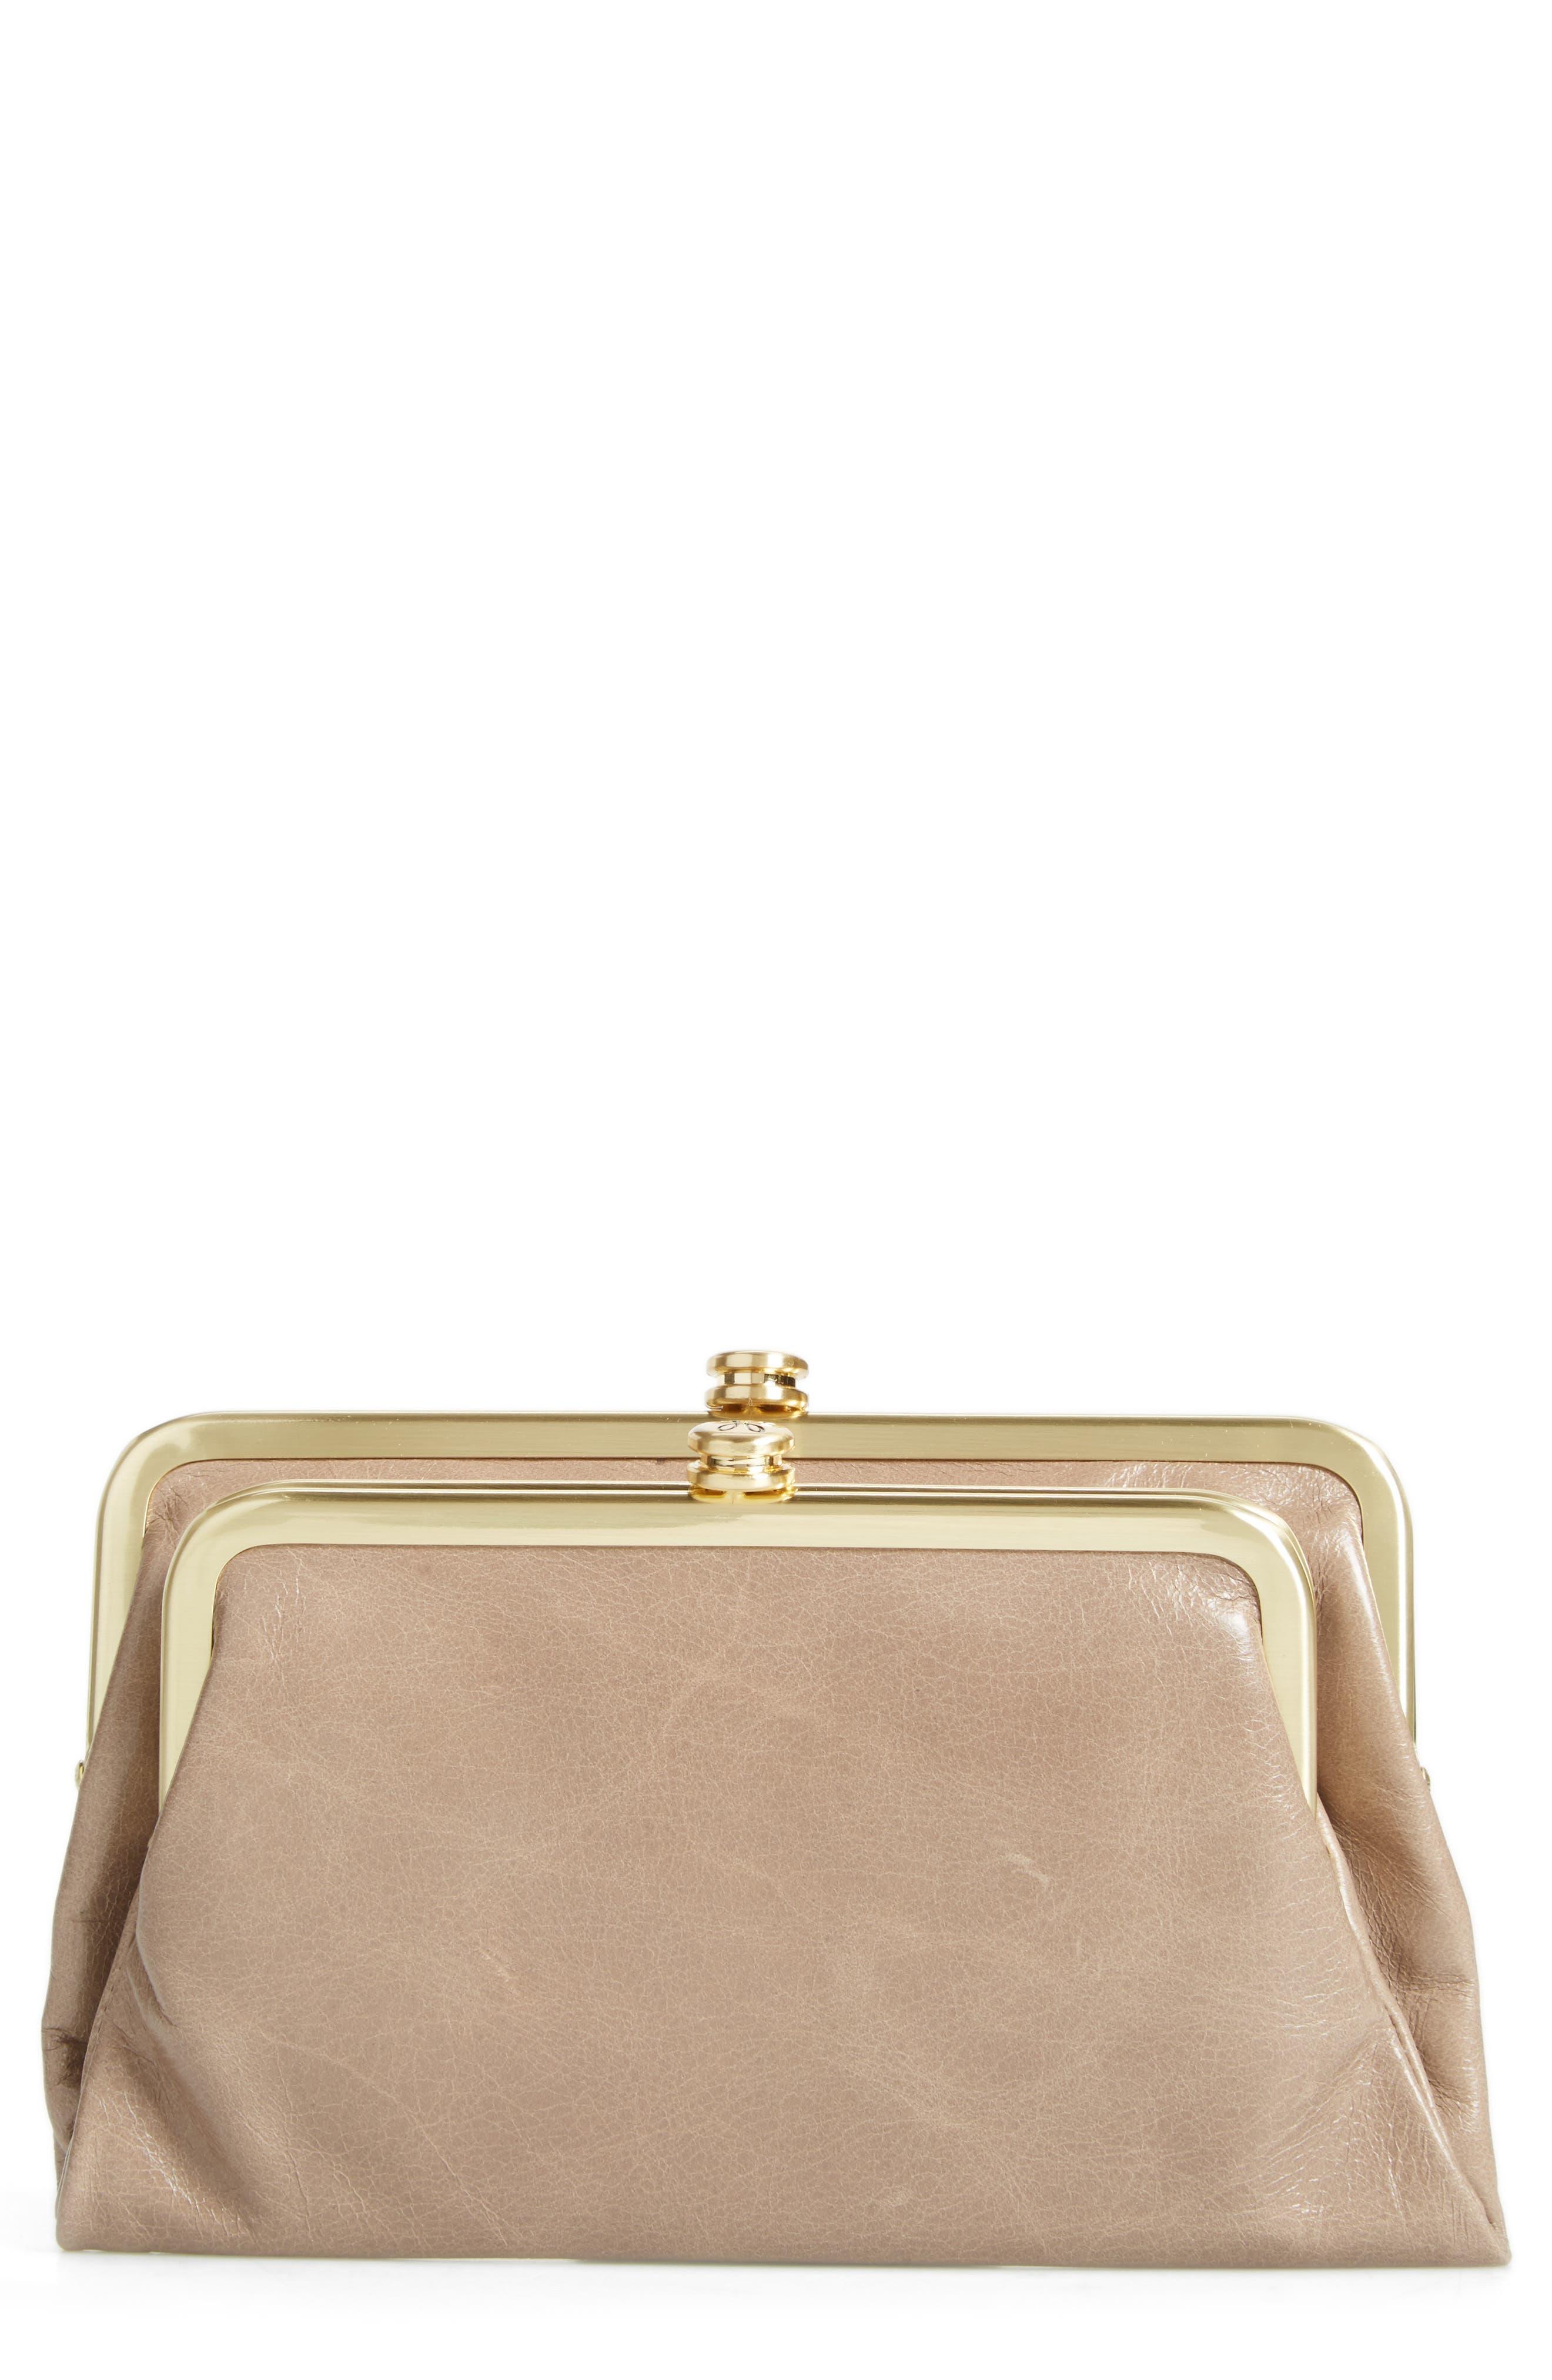 Main Image - Hobo Suzette Calfskin Leather Wallet